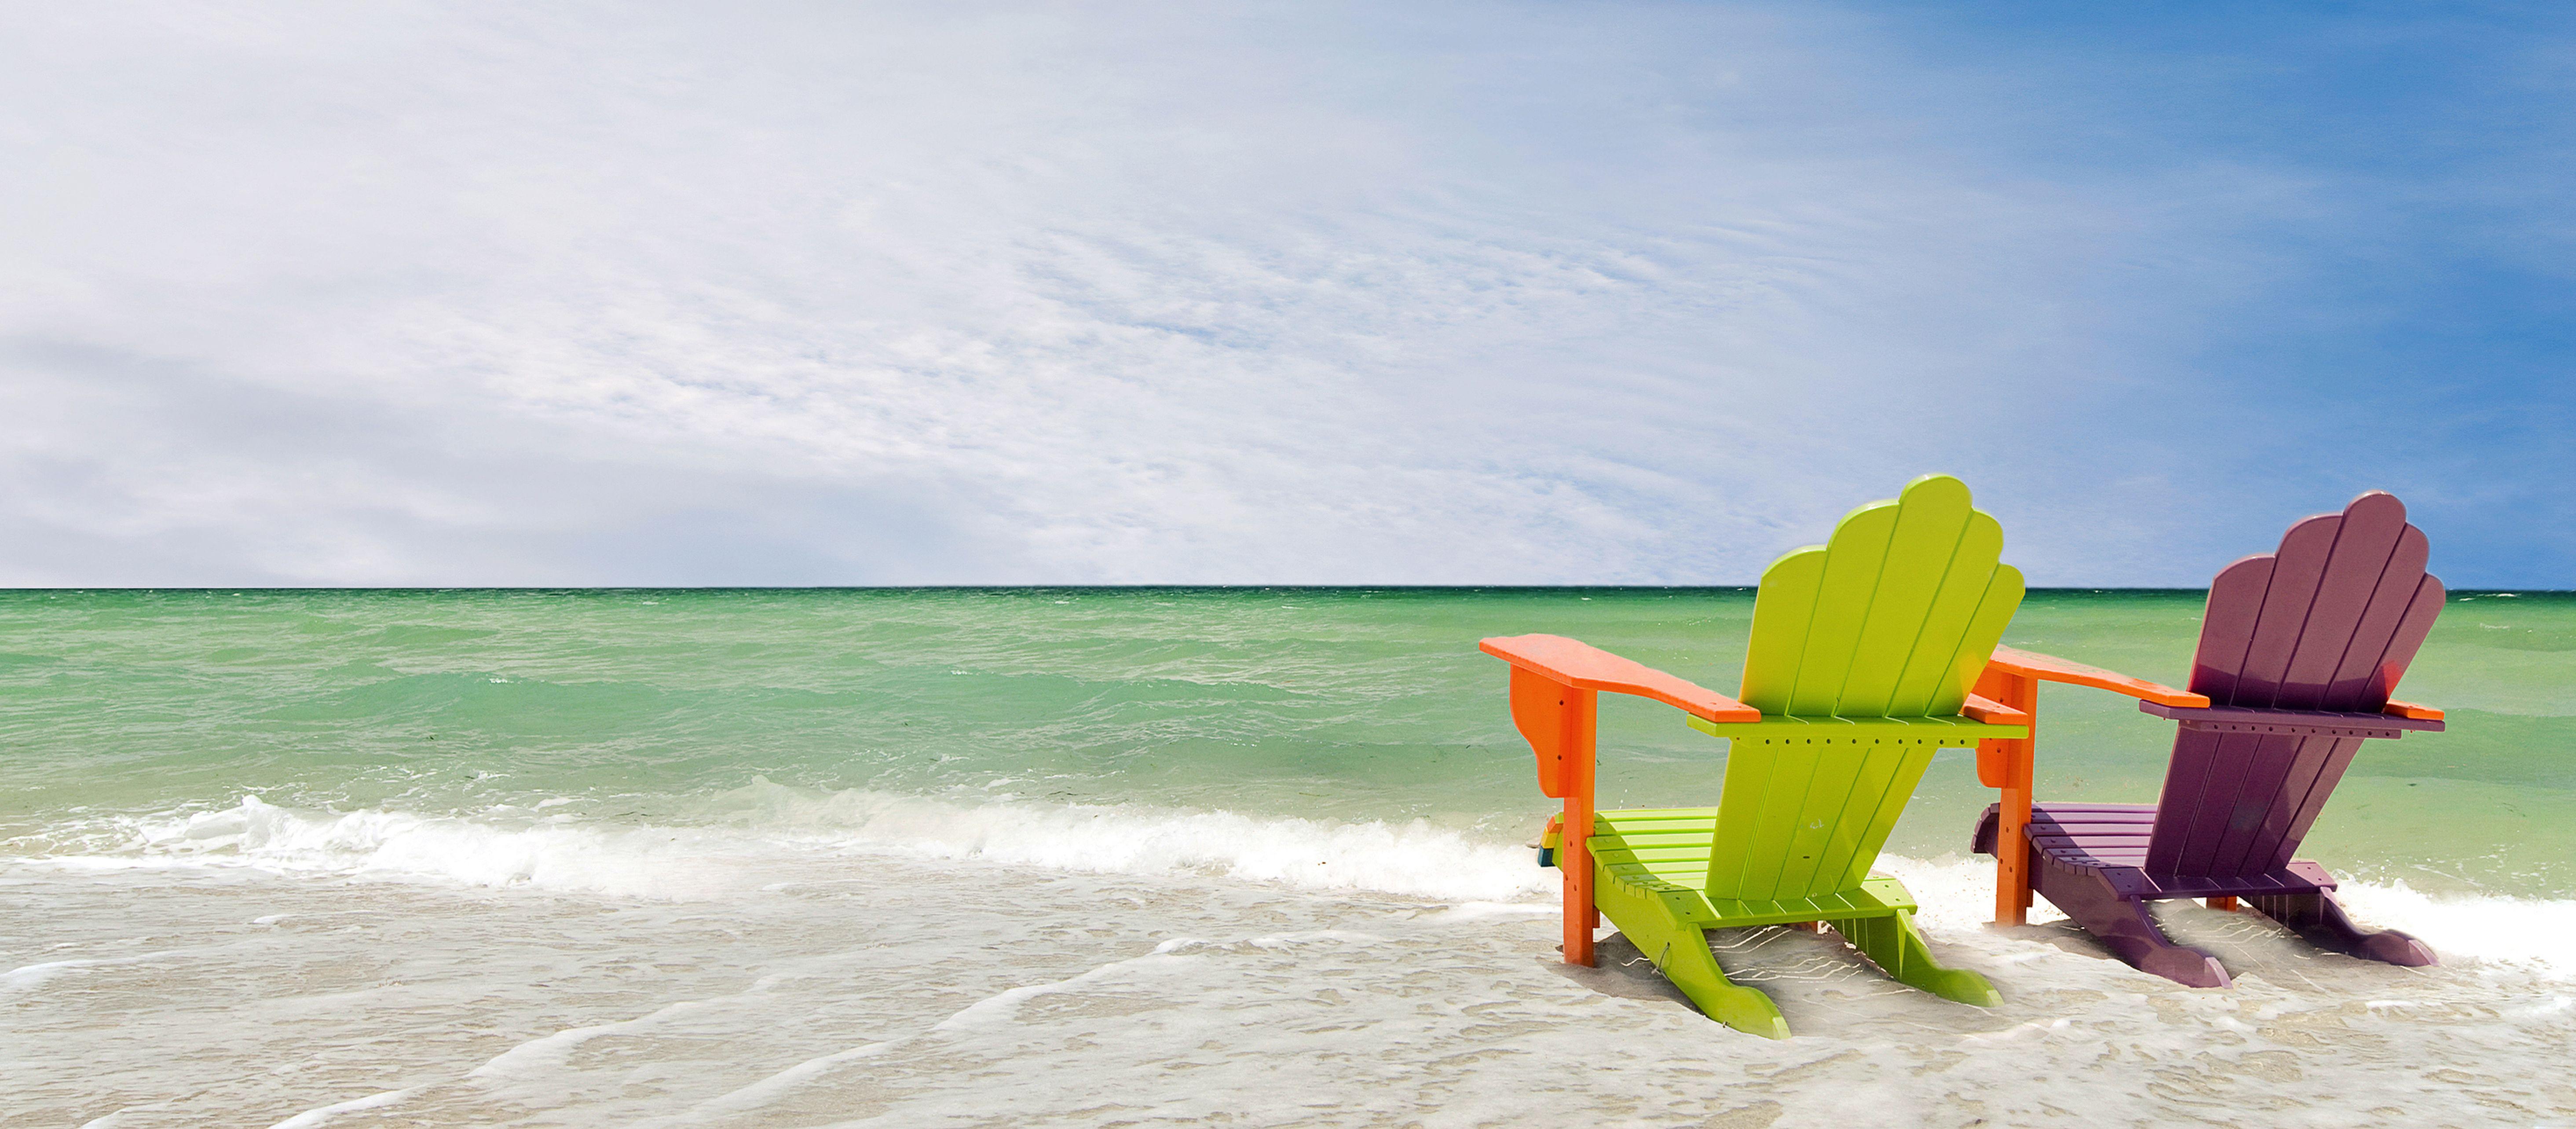 Bunte Lounge Chairs am Strand von Miami, Florida, USA